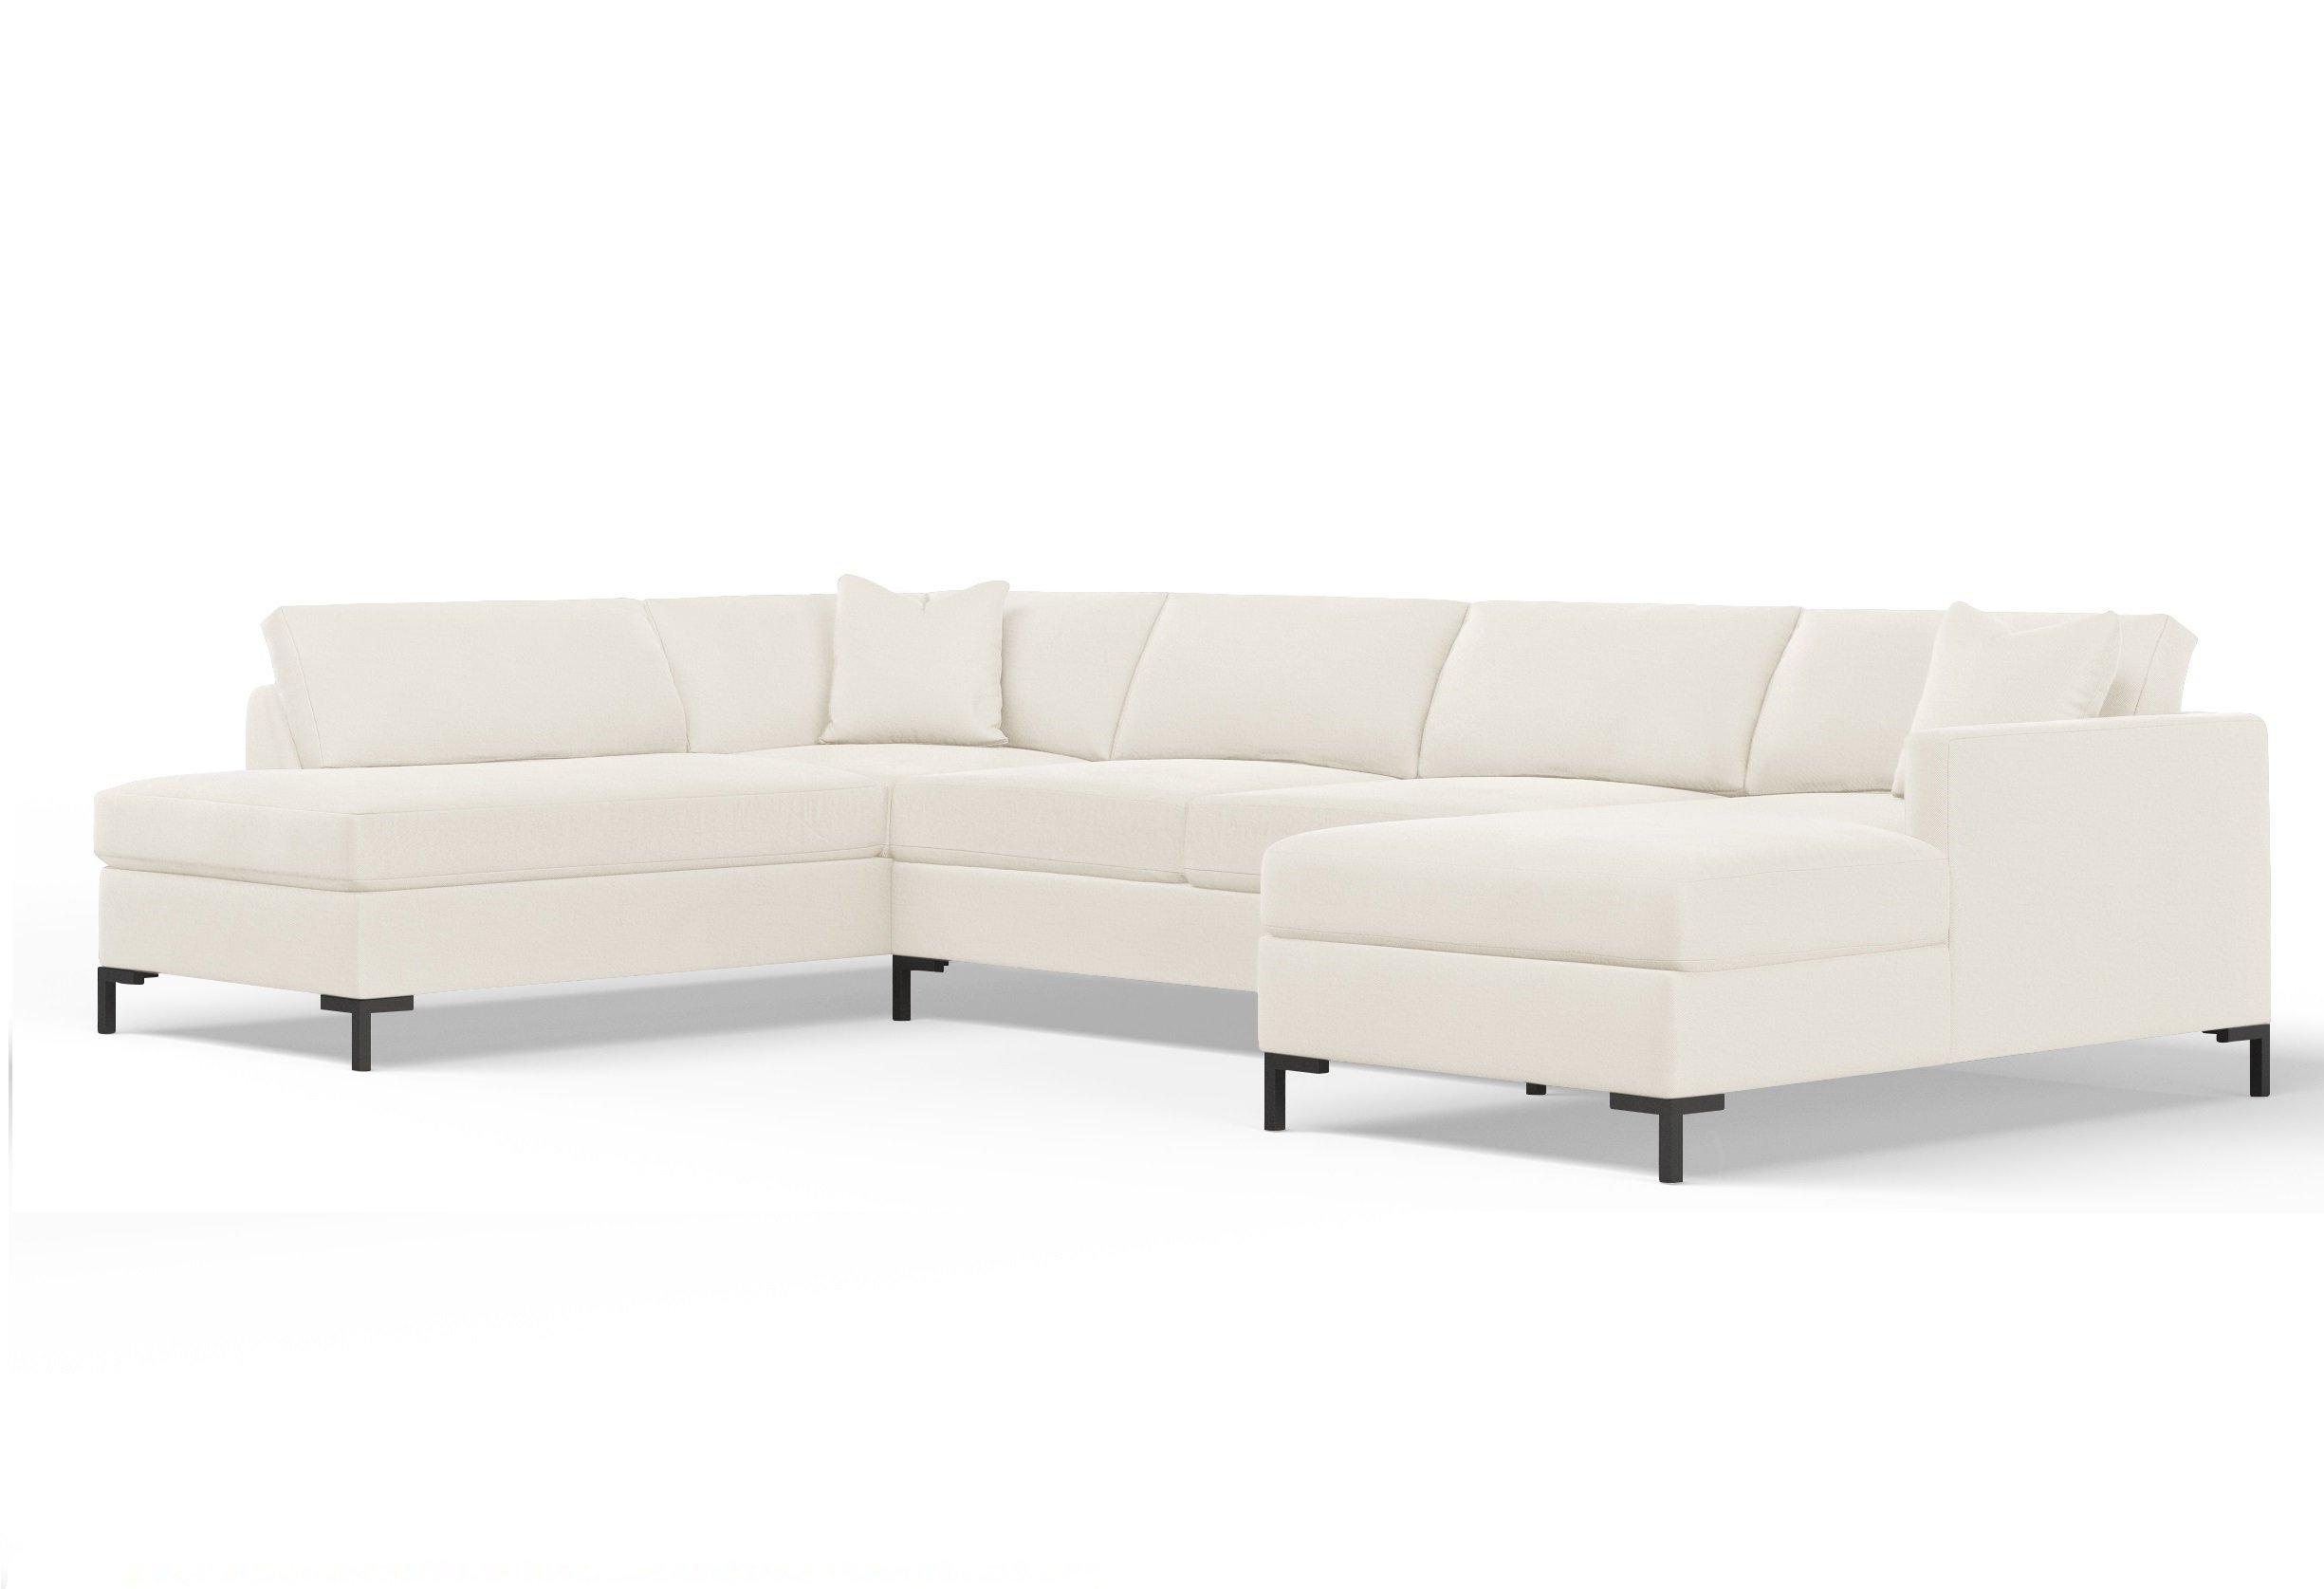 Wayfair Custom Upholstery™ Audrey Modular Sectional | Wayfair Pertaining To Cohen Down 2 Piece Sectionals (View 25 of 25)